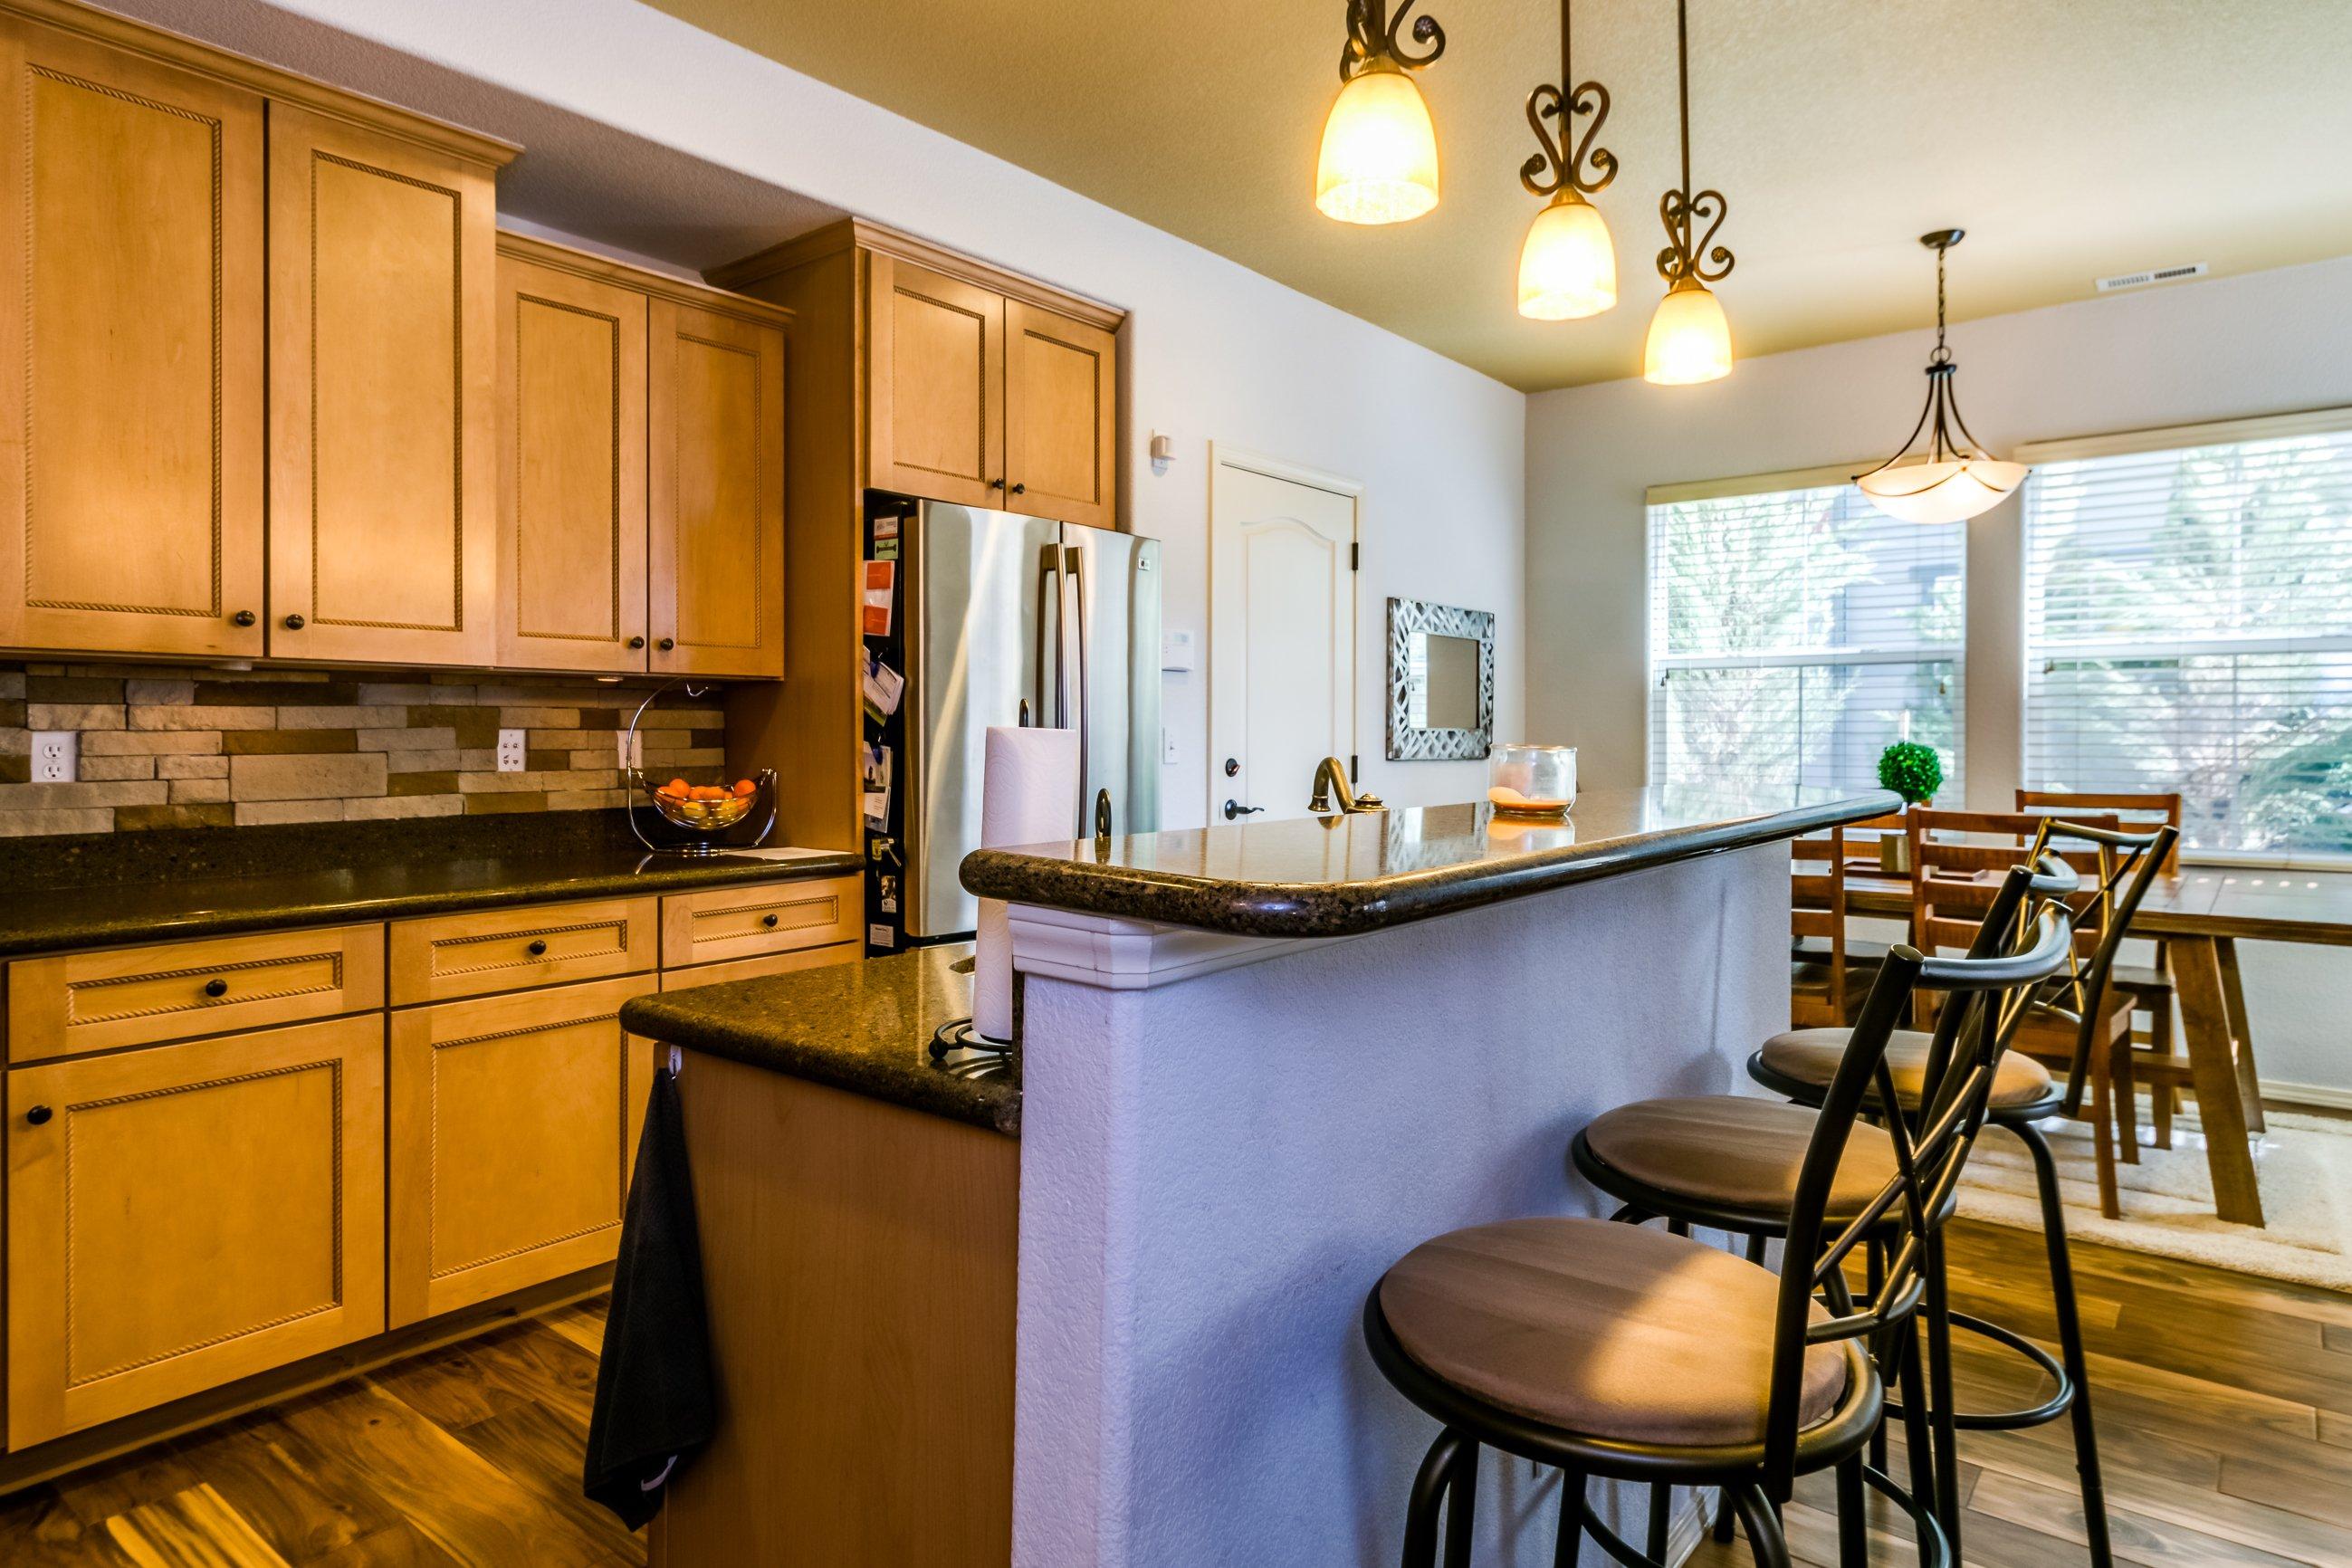 Gold Hill Mesa condo for sale, picture of kitchen